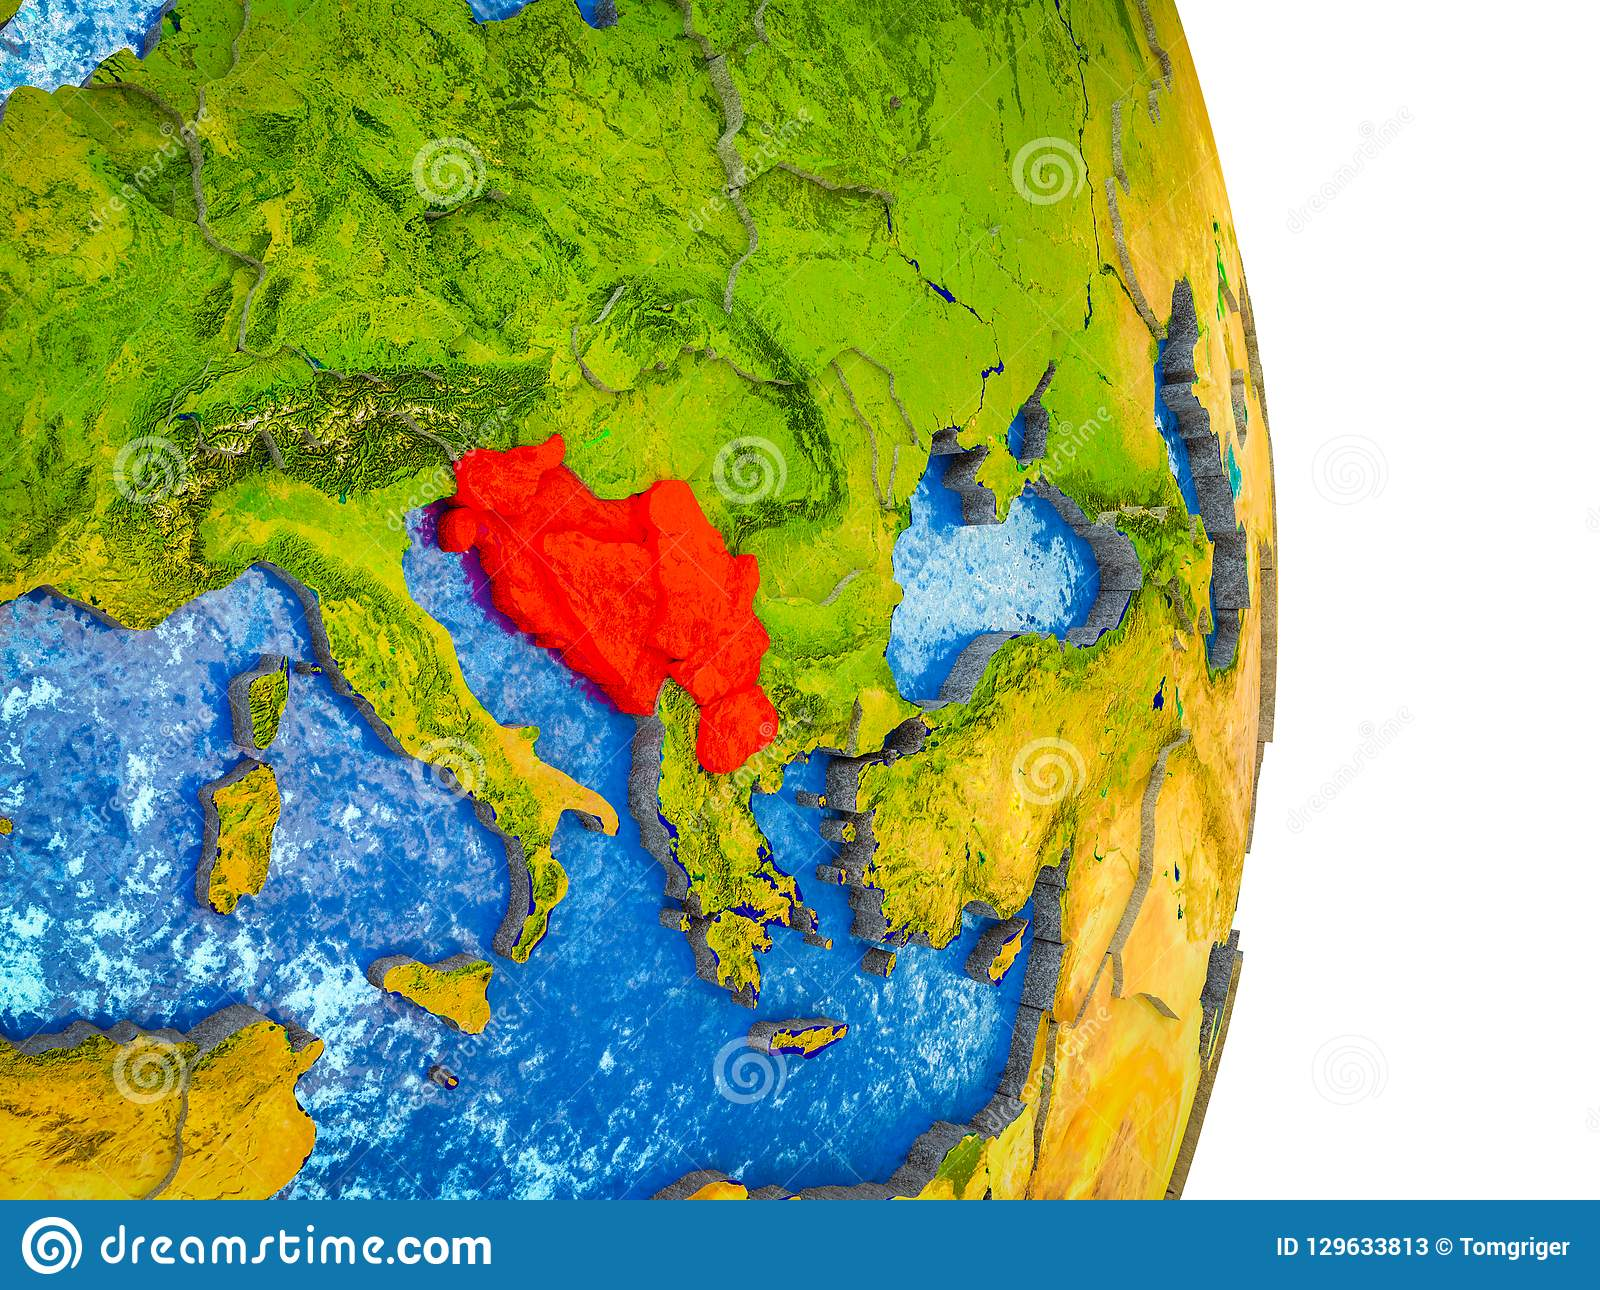 Jugoslawien Karte.Karte Des Jugoslawiens Auf Erde 3d Stock Abbildung Illustration